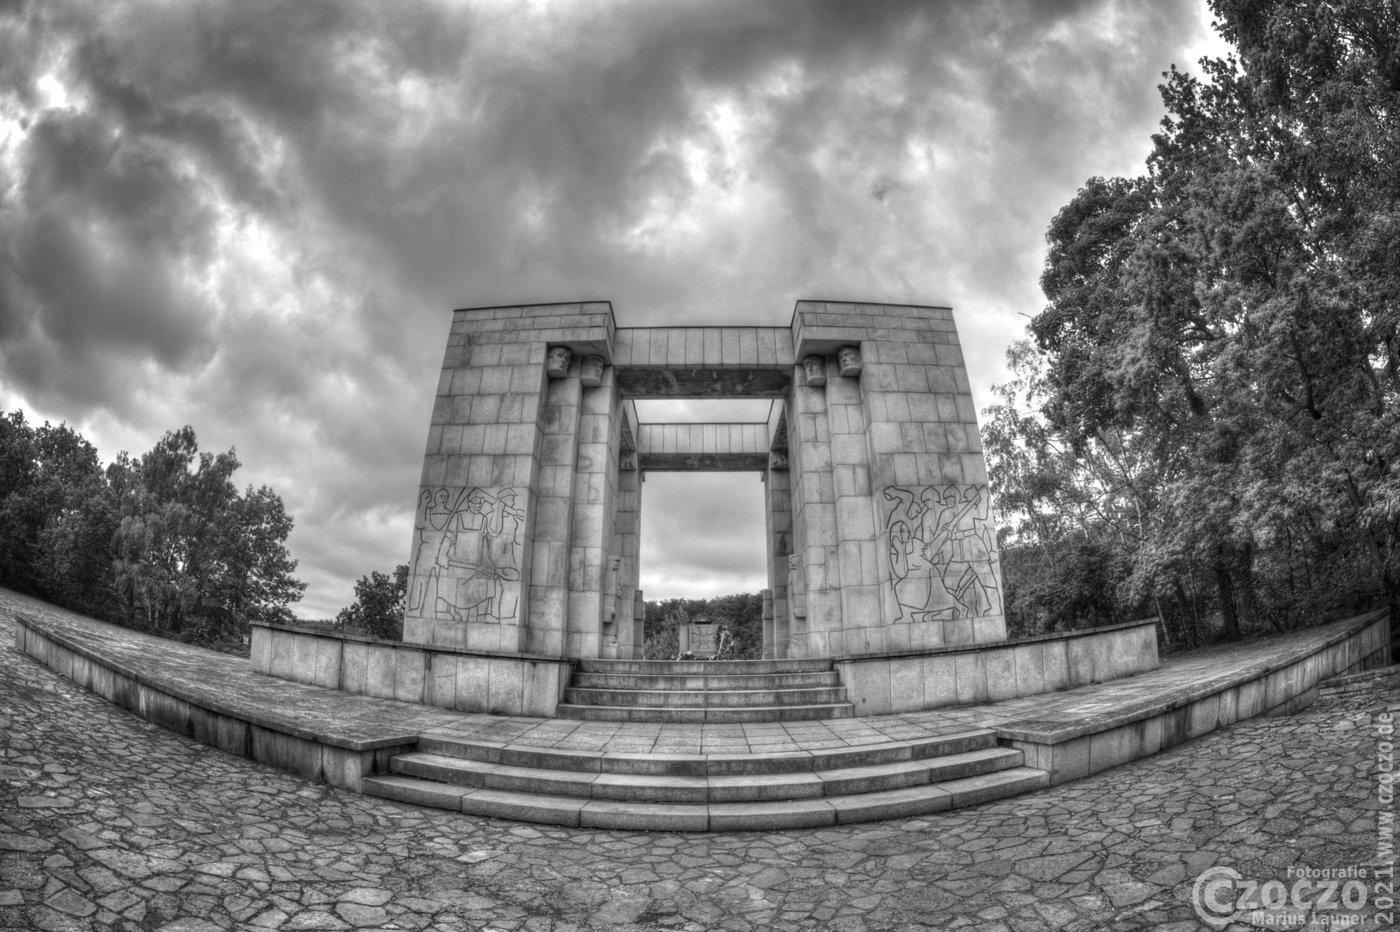 20210625-Annaberg-Denkmal-9A1A3062_3_4_5_6_Enhancer